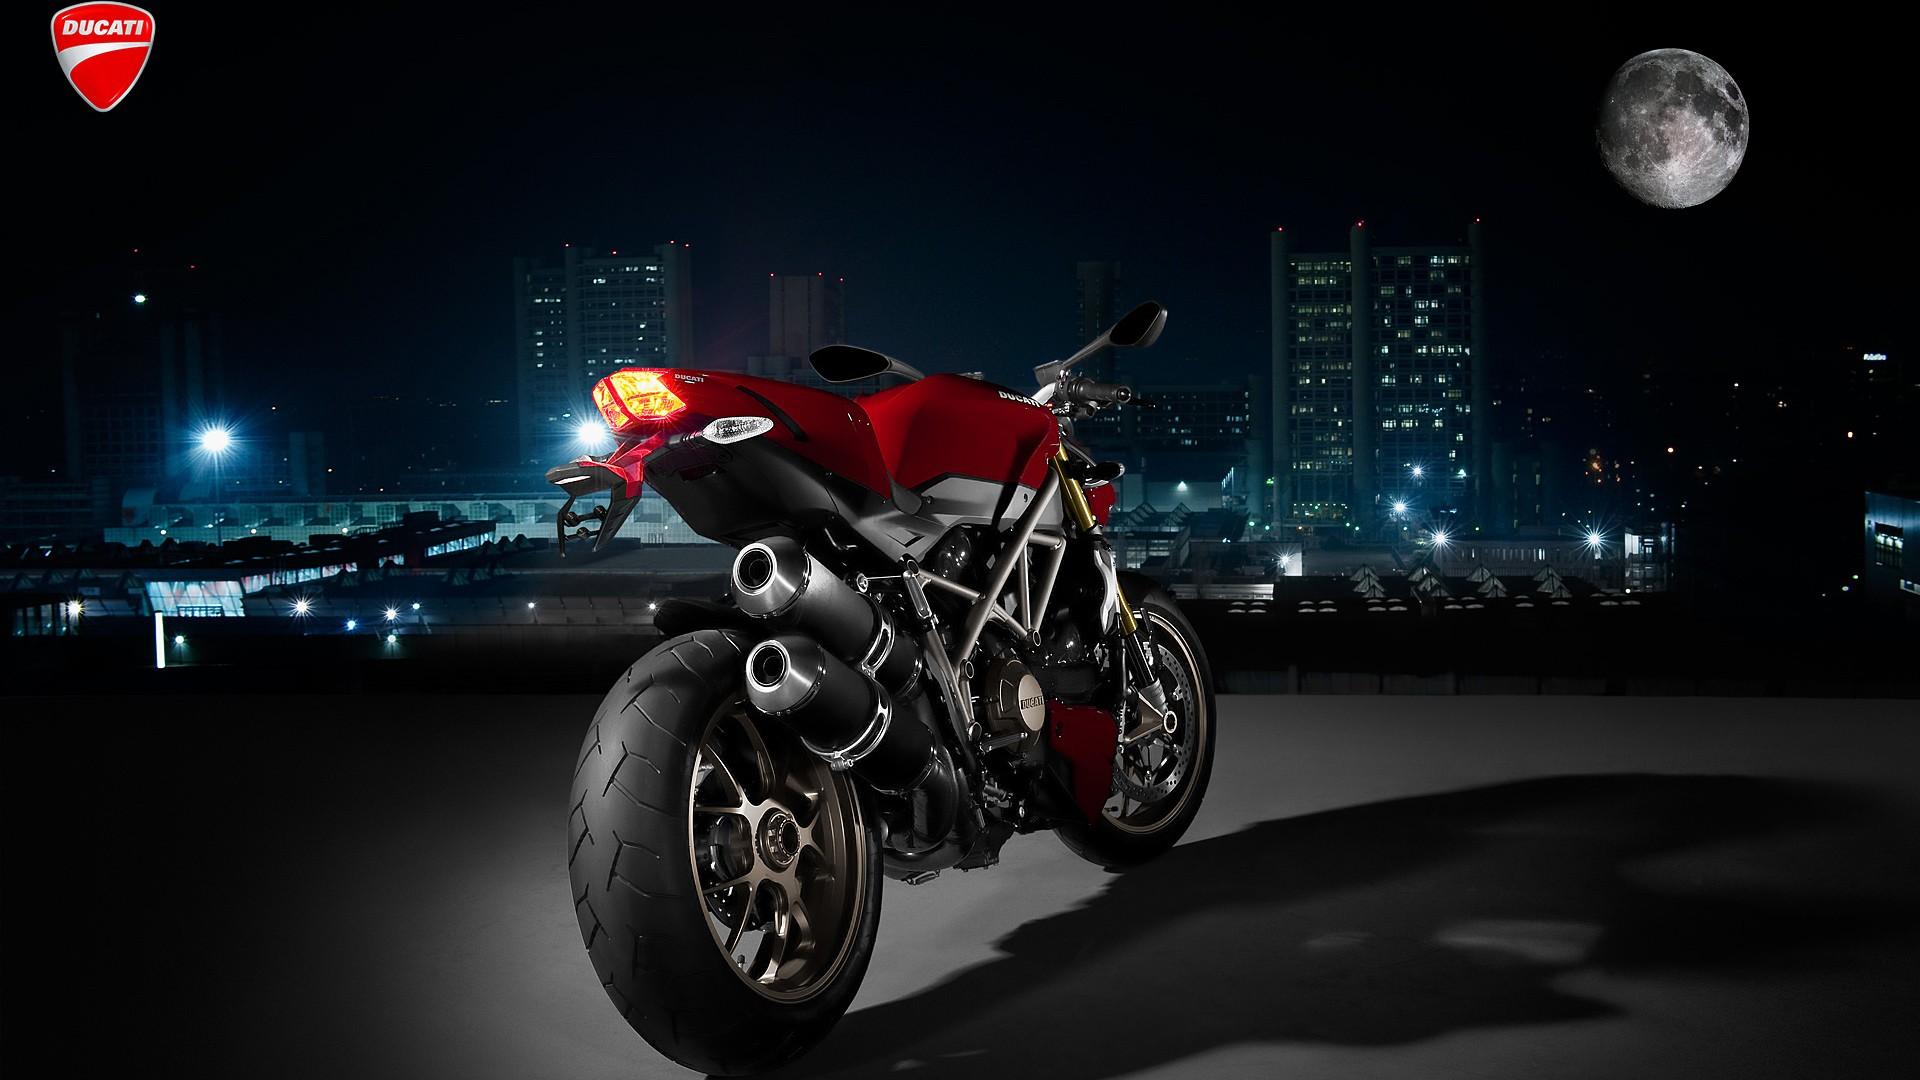 Ducati Streetfighter 848 wallpaper   86247 1920x1080